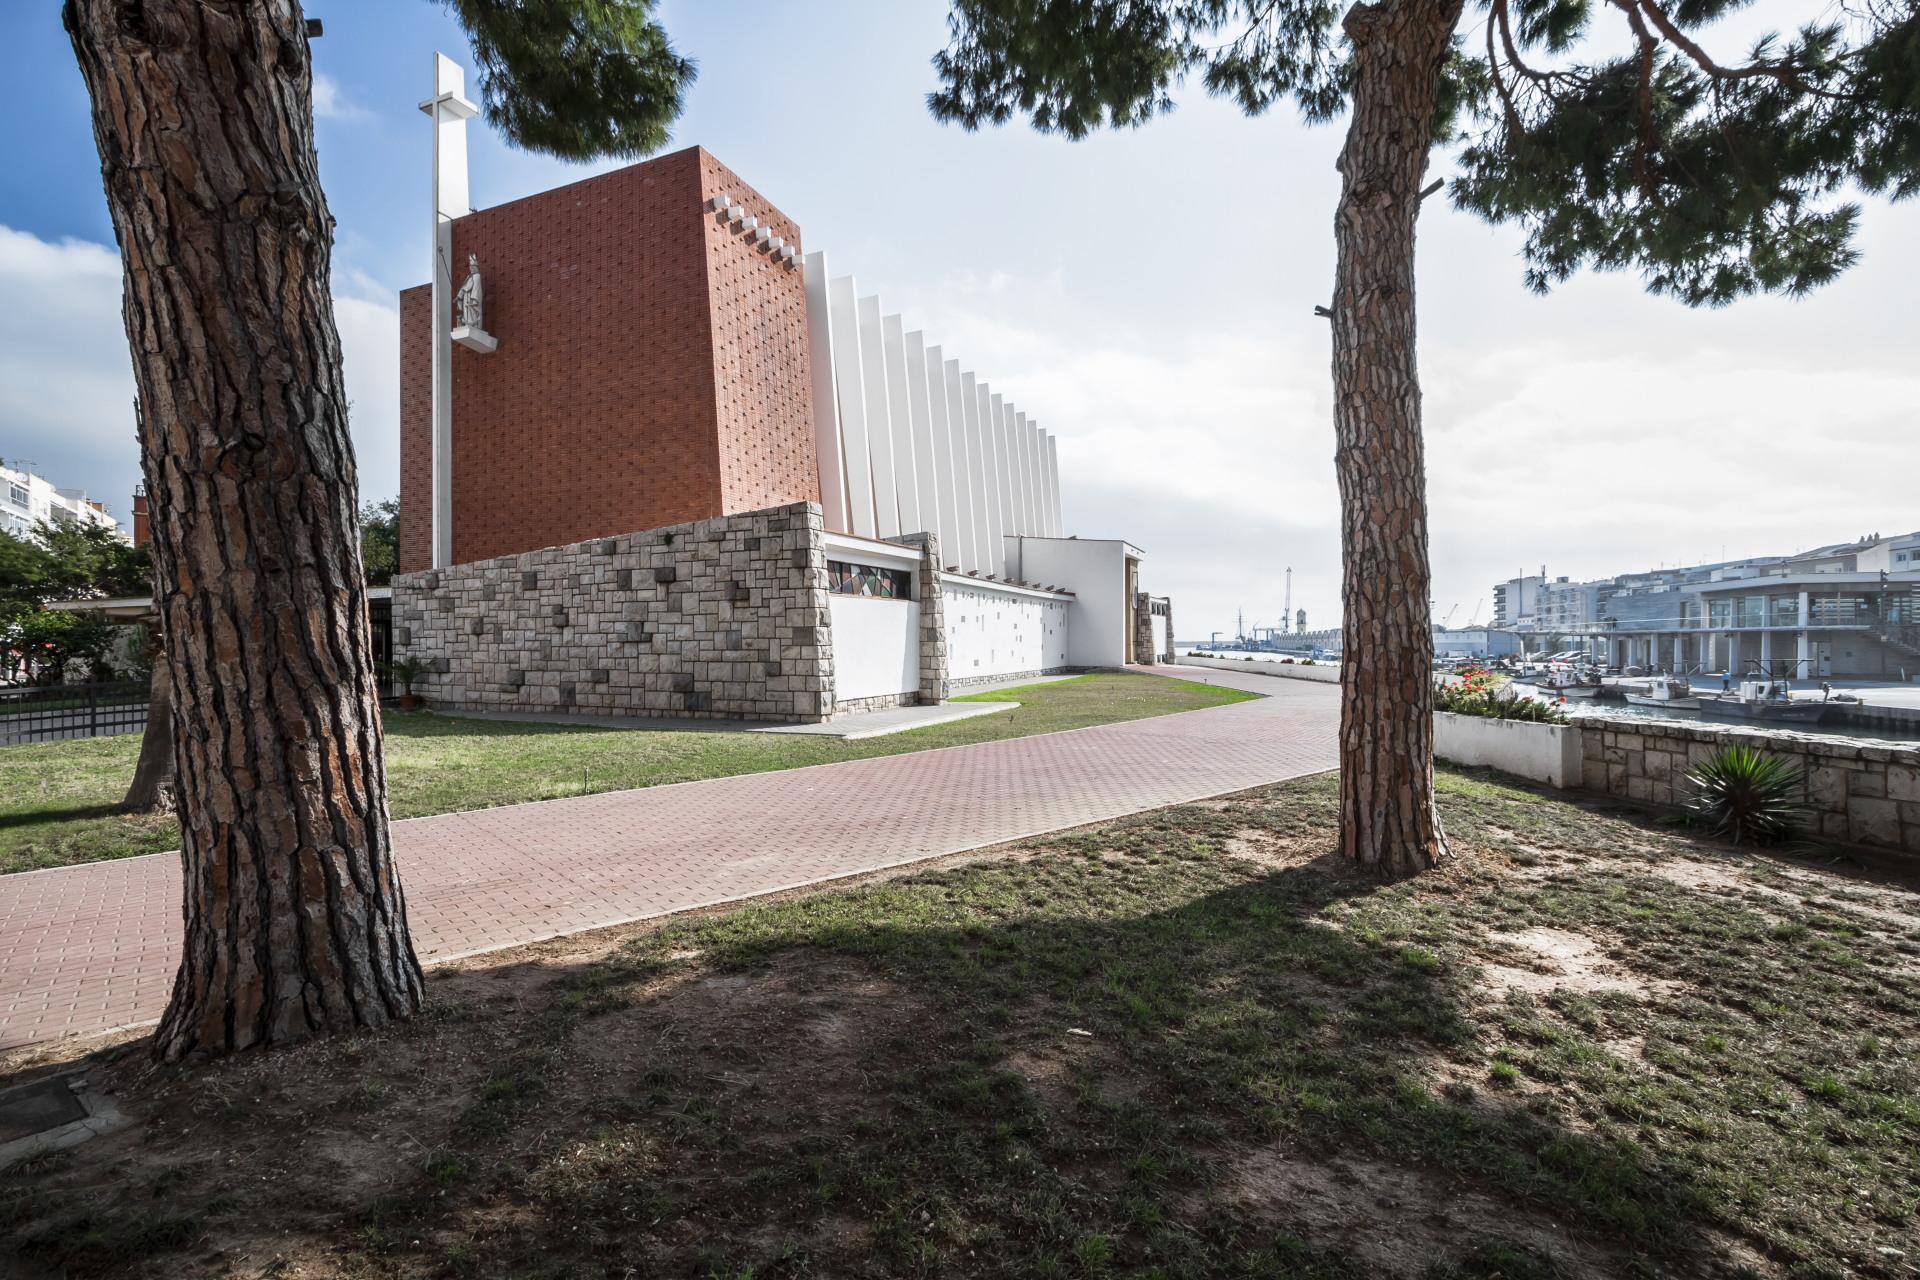 fotografia-arquitectura-valencia-gandia-german-cabo-iglesia-san-nicolas-torroja (5)